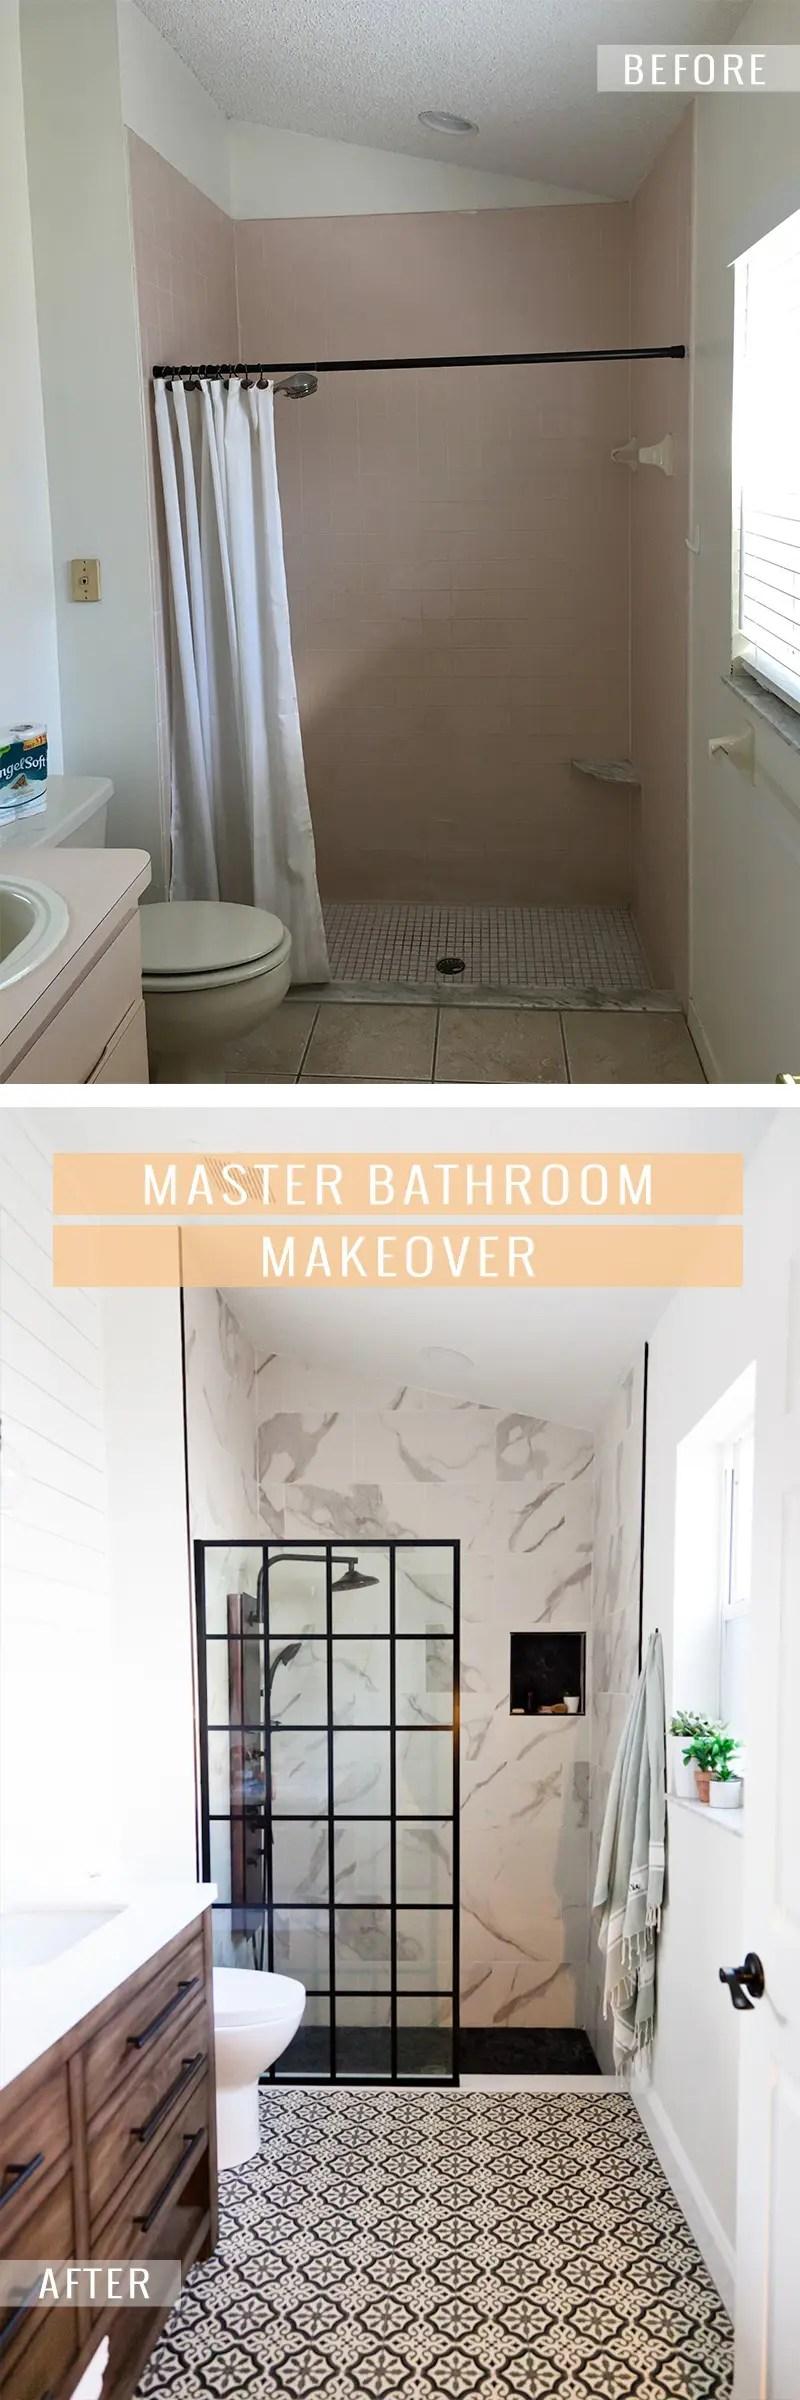 Farmhouse Master Bathroom Renovation Ideas Fresh Mommy Blog